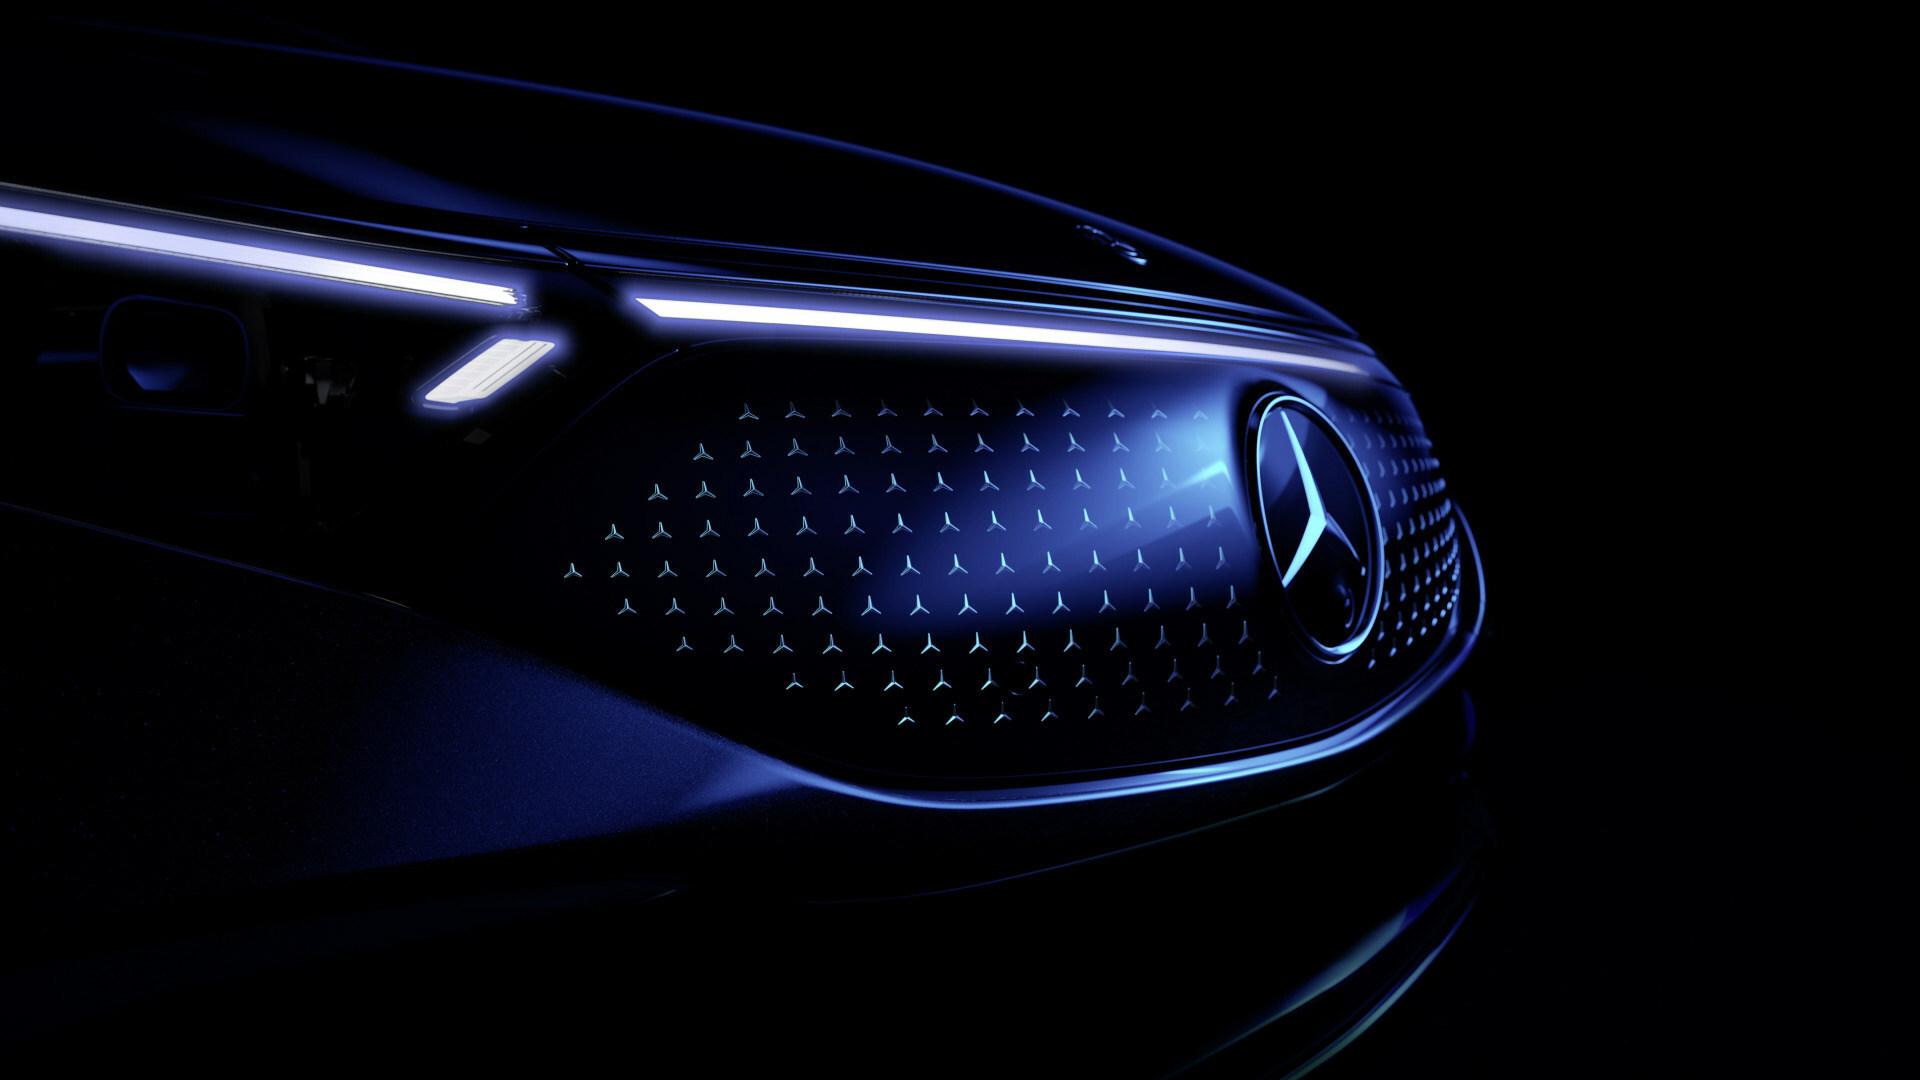 Elektroautos, Elektromobilität, Mercedes Benz, Daimler, Mercedes, EQS